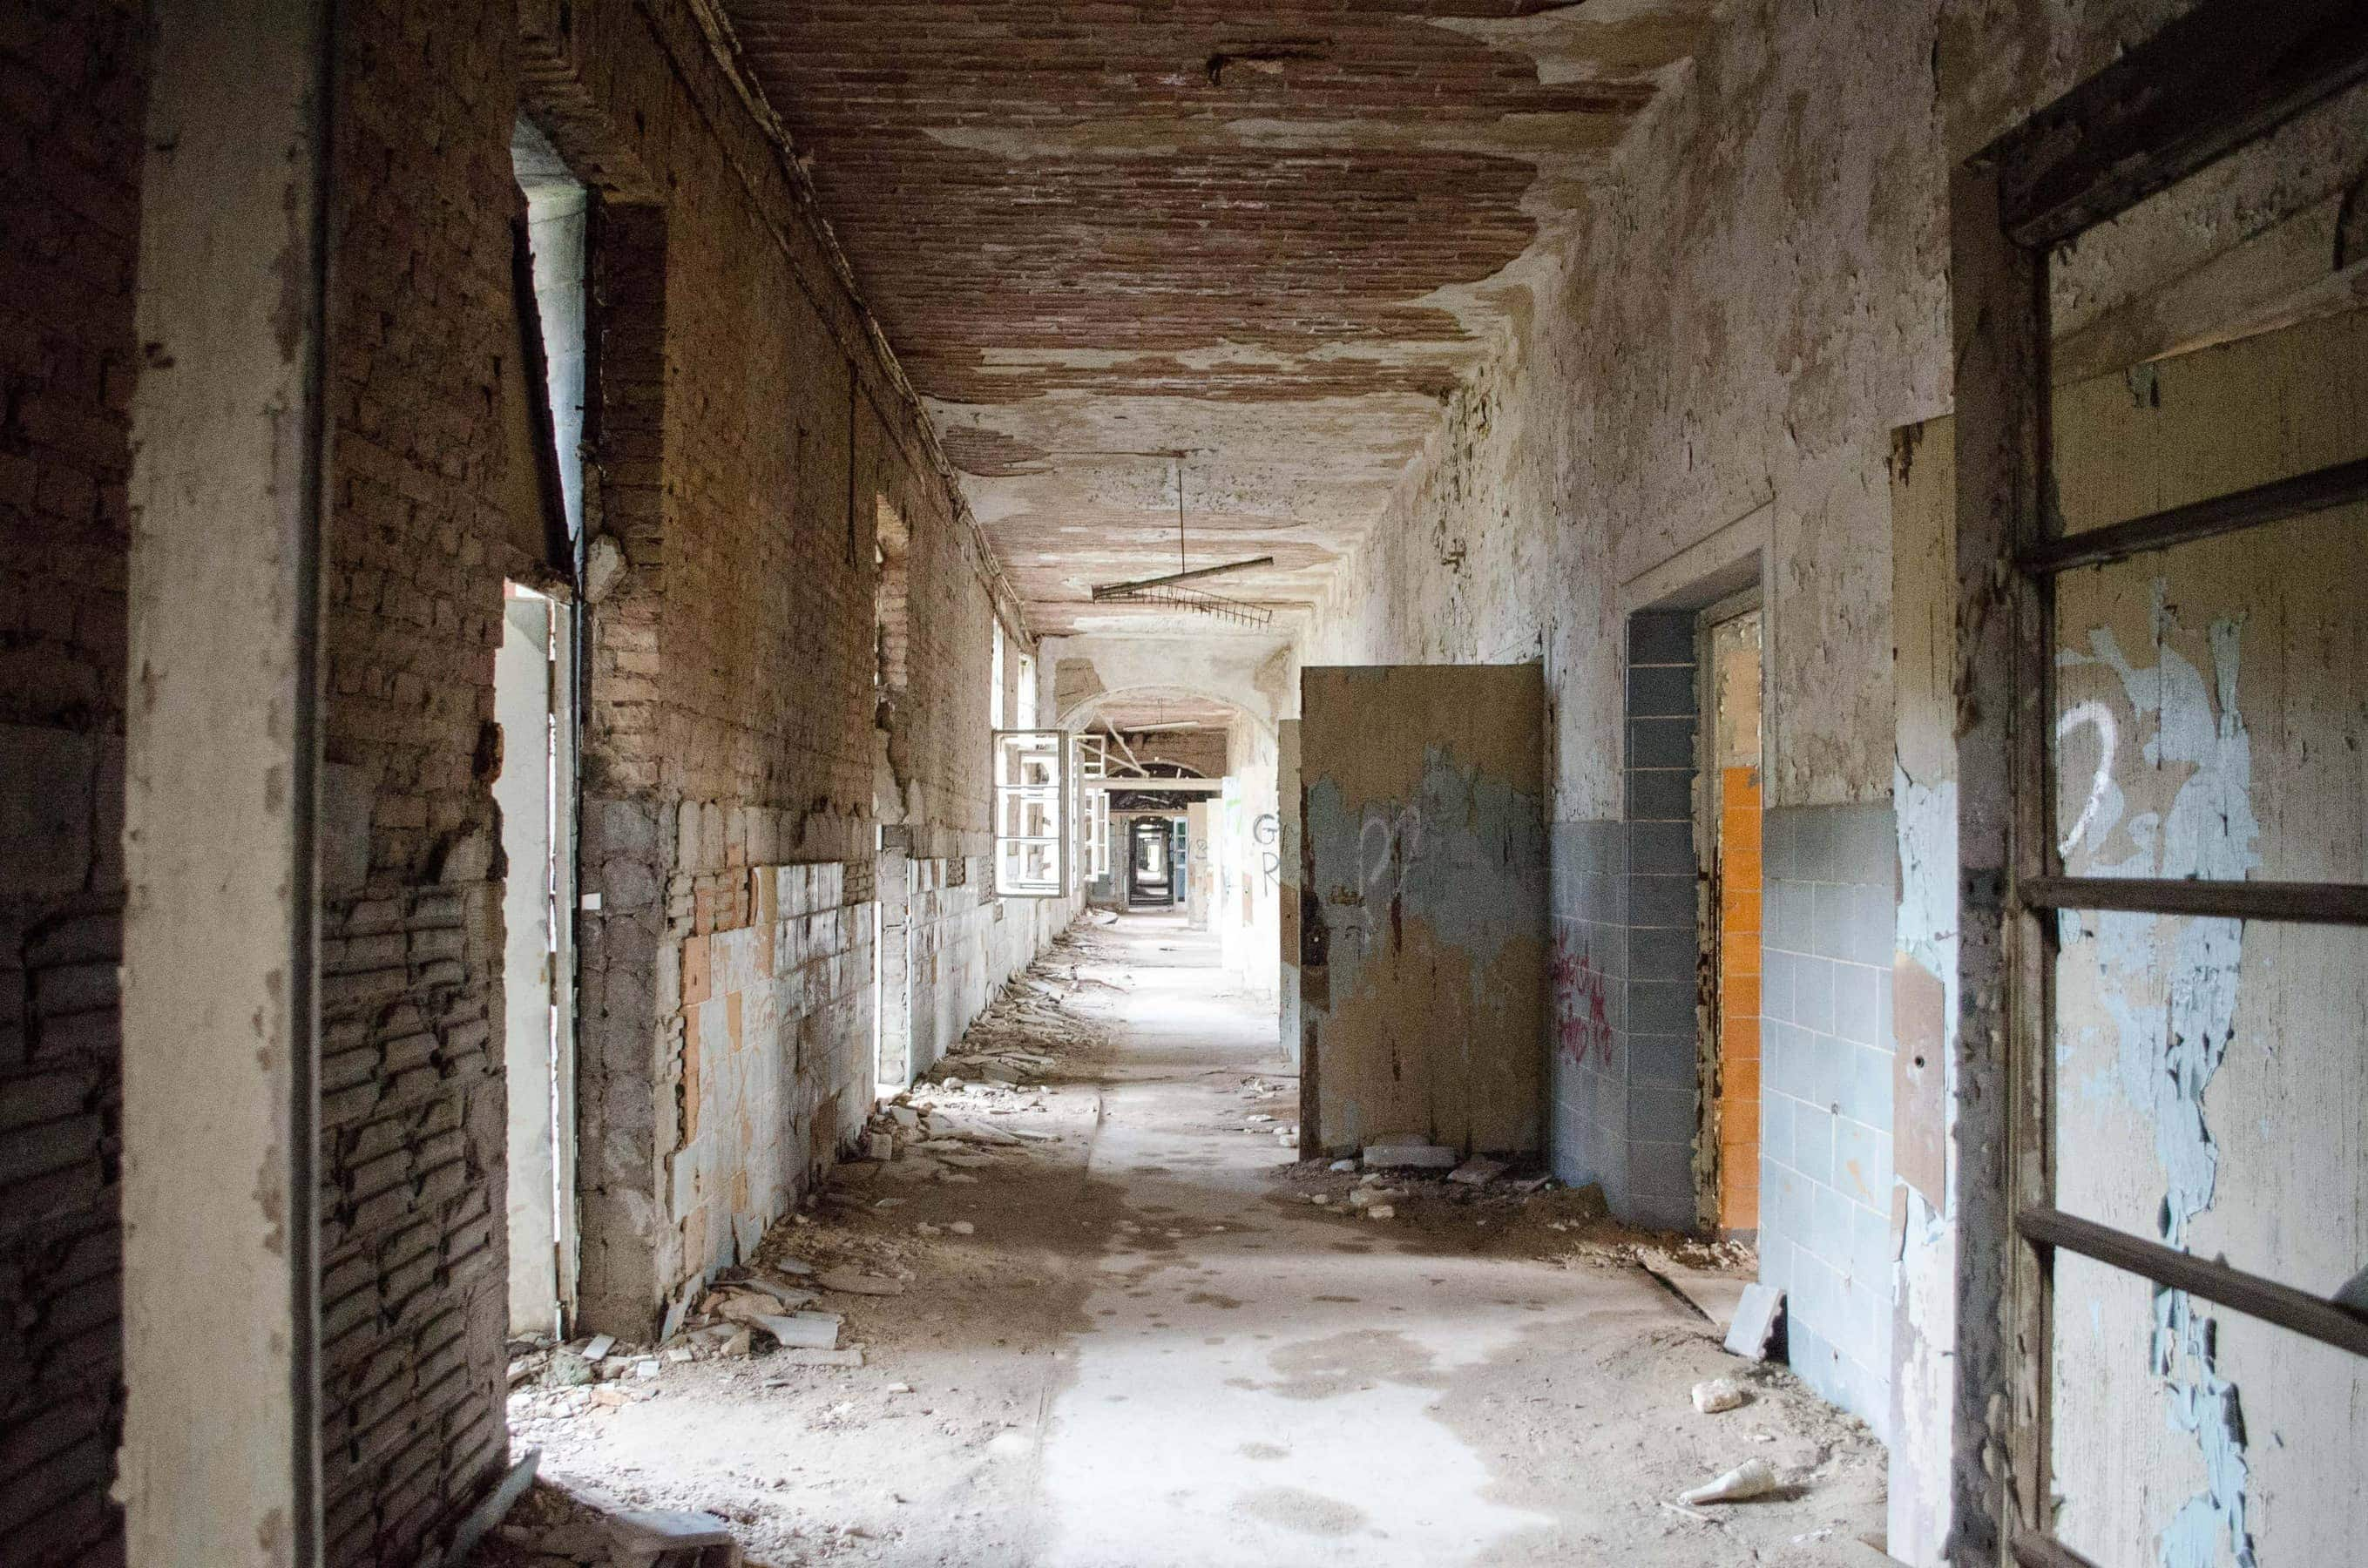 Bettentrakt in den Beelitz-Heilsätten